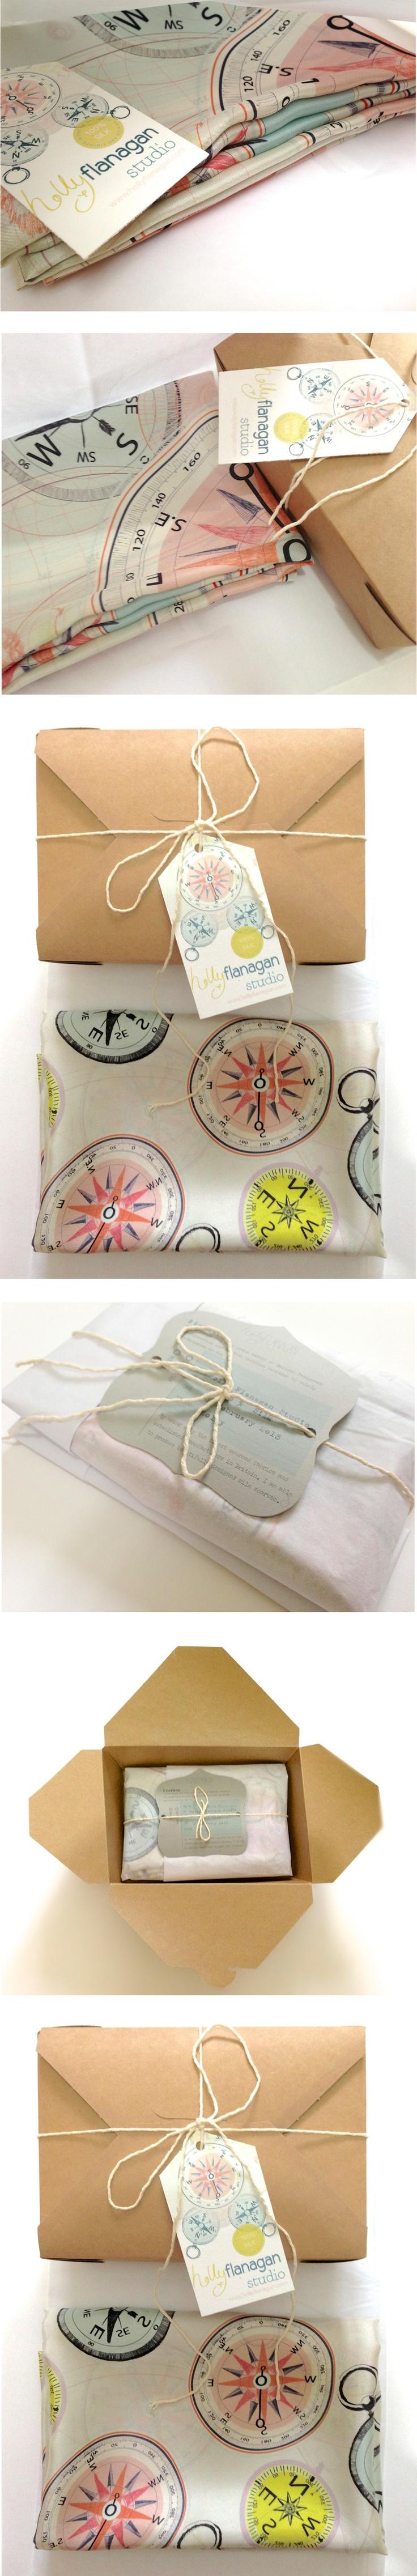 Beautiful packaging from Holly Flanagan Studio www.hollyflanagan.com